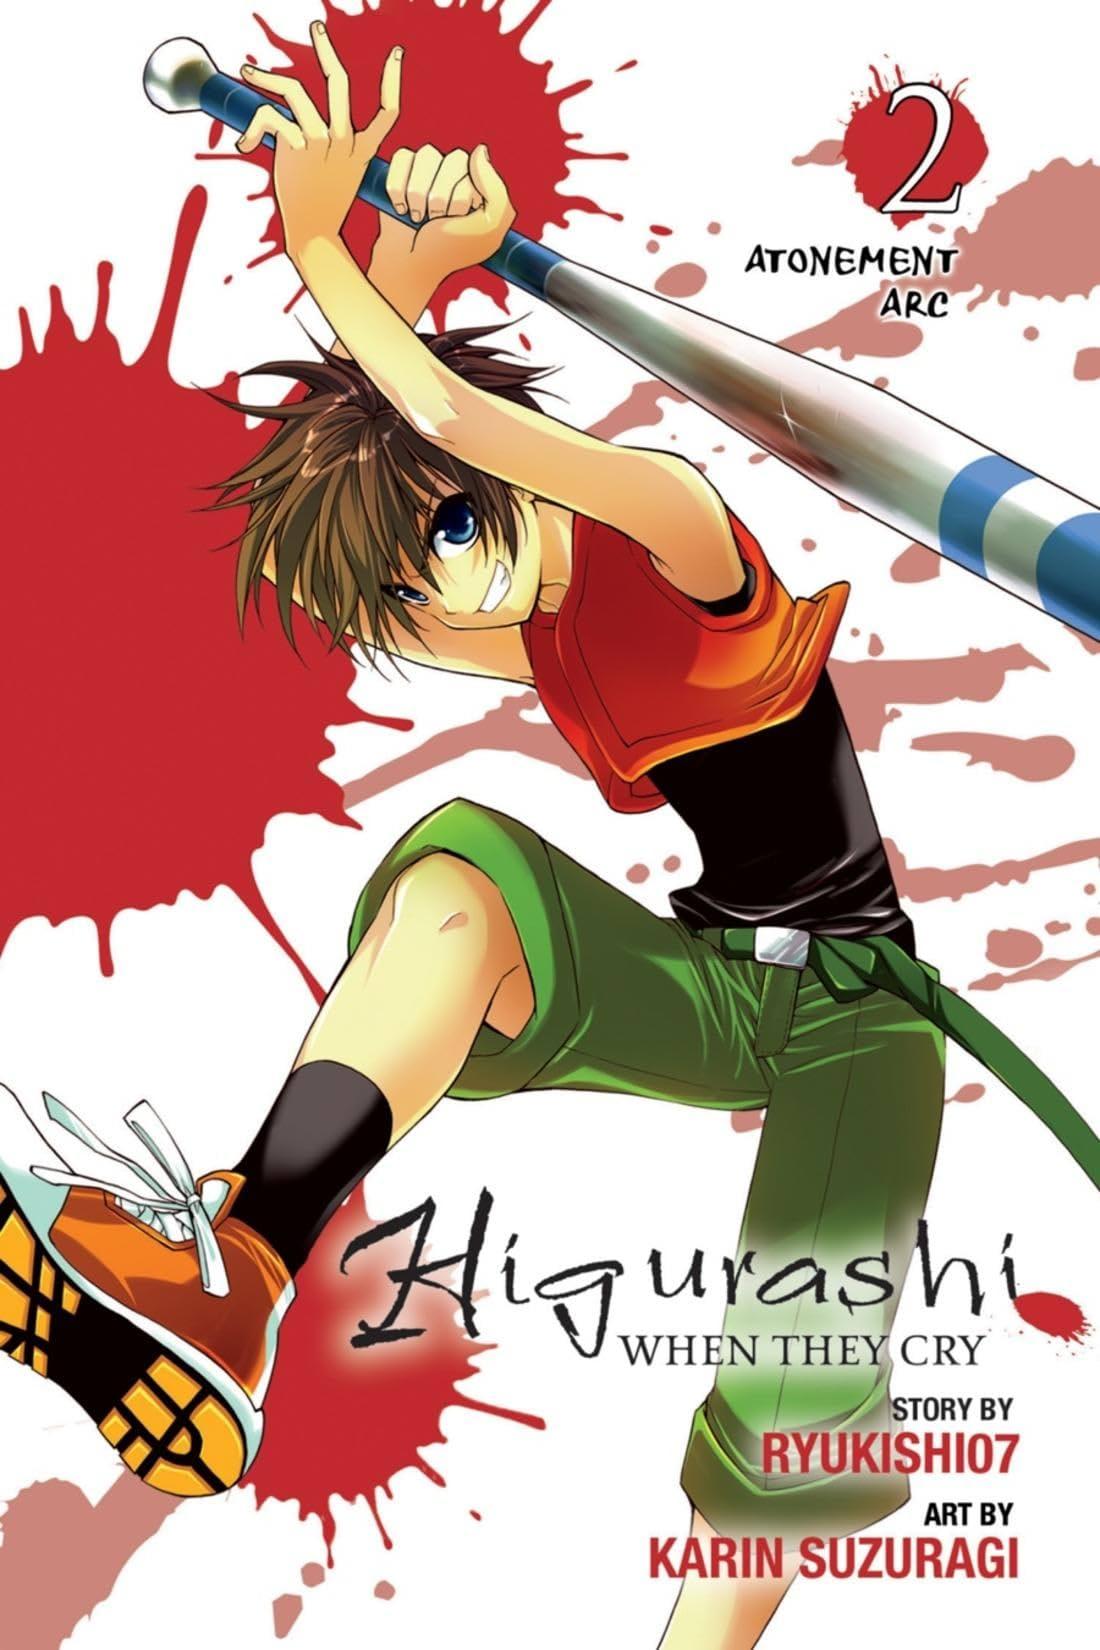 Higurashi When They Cry Vol. 2: Atonement Arc